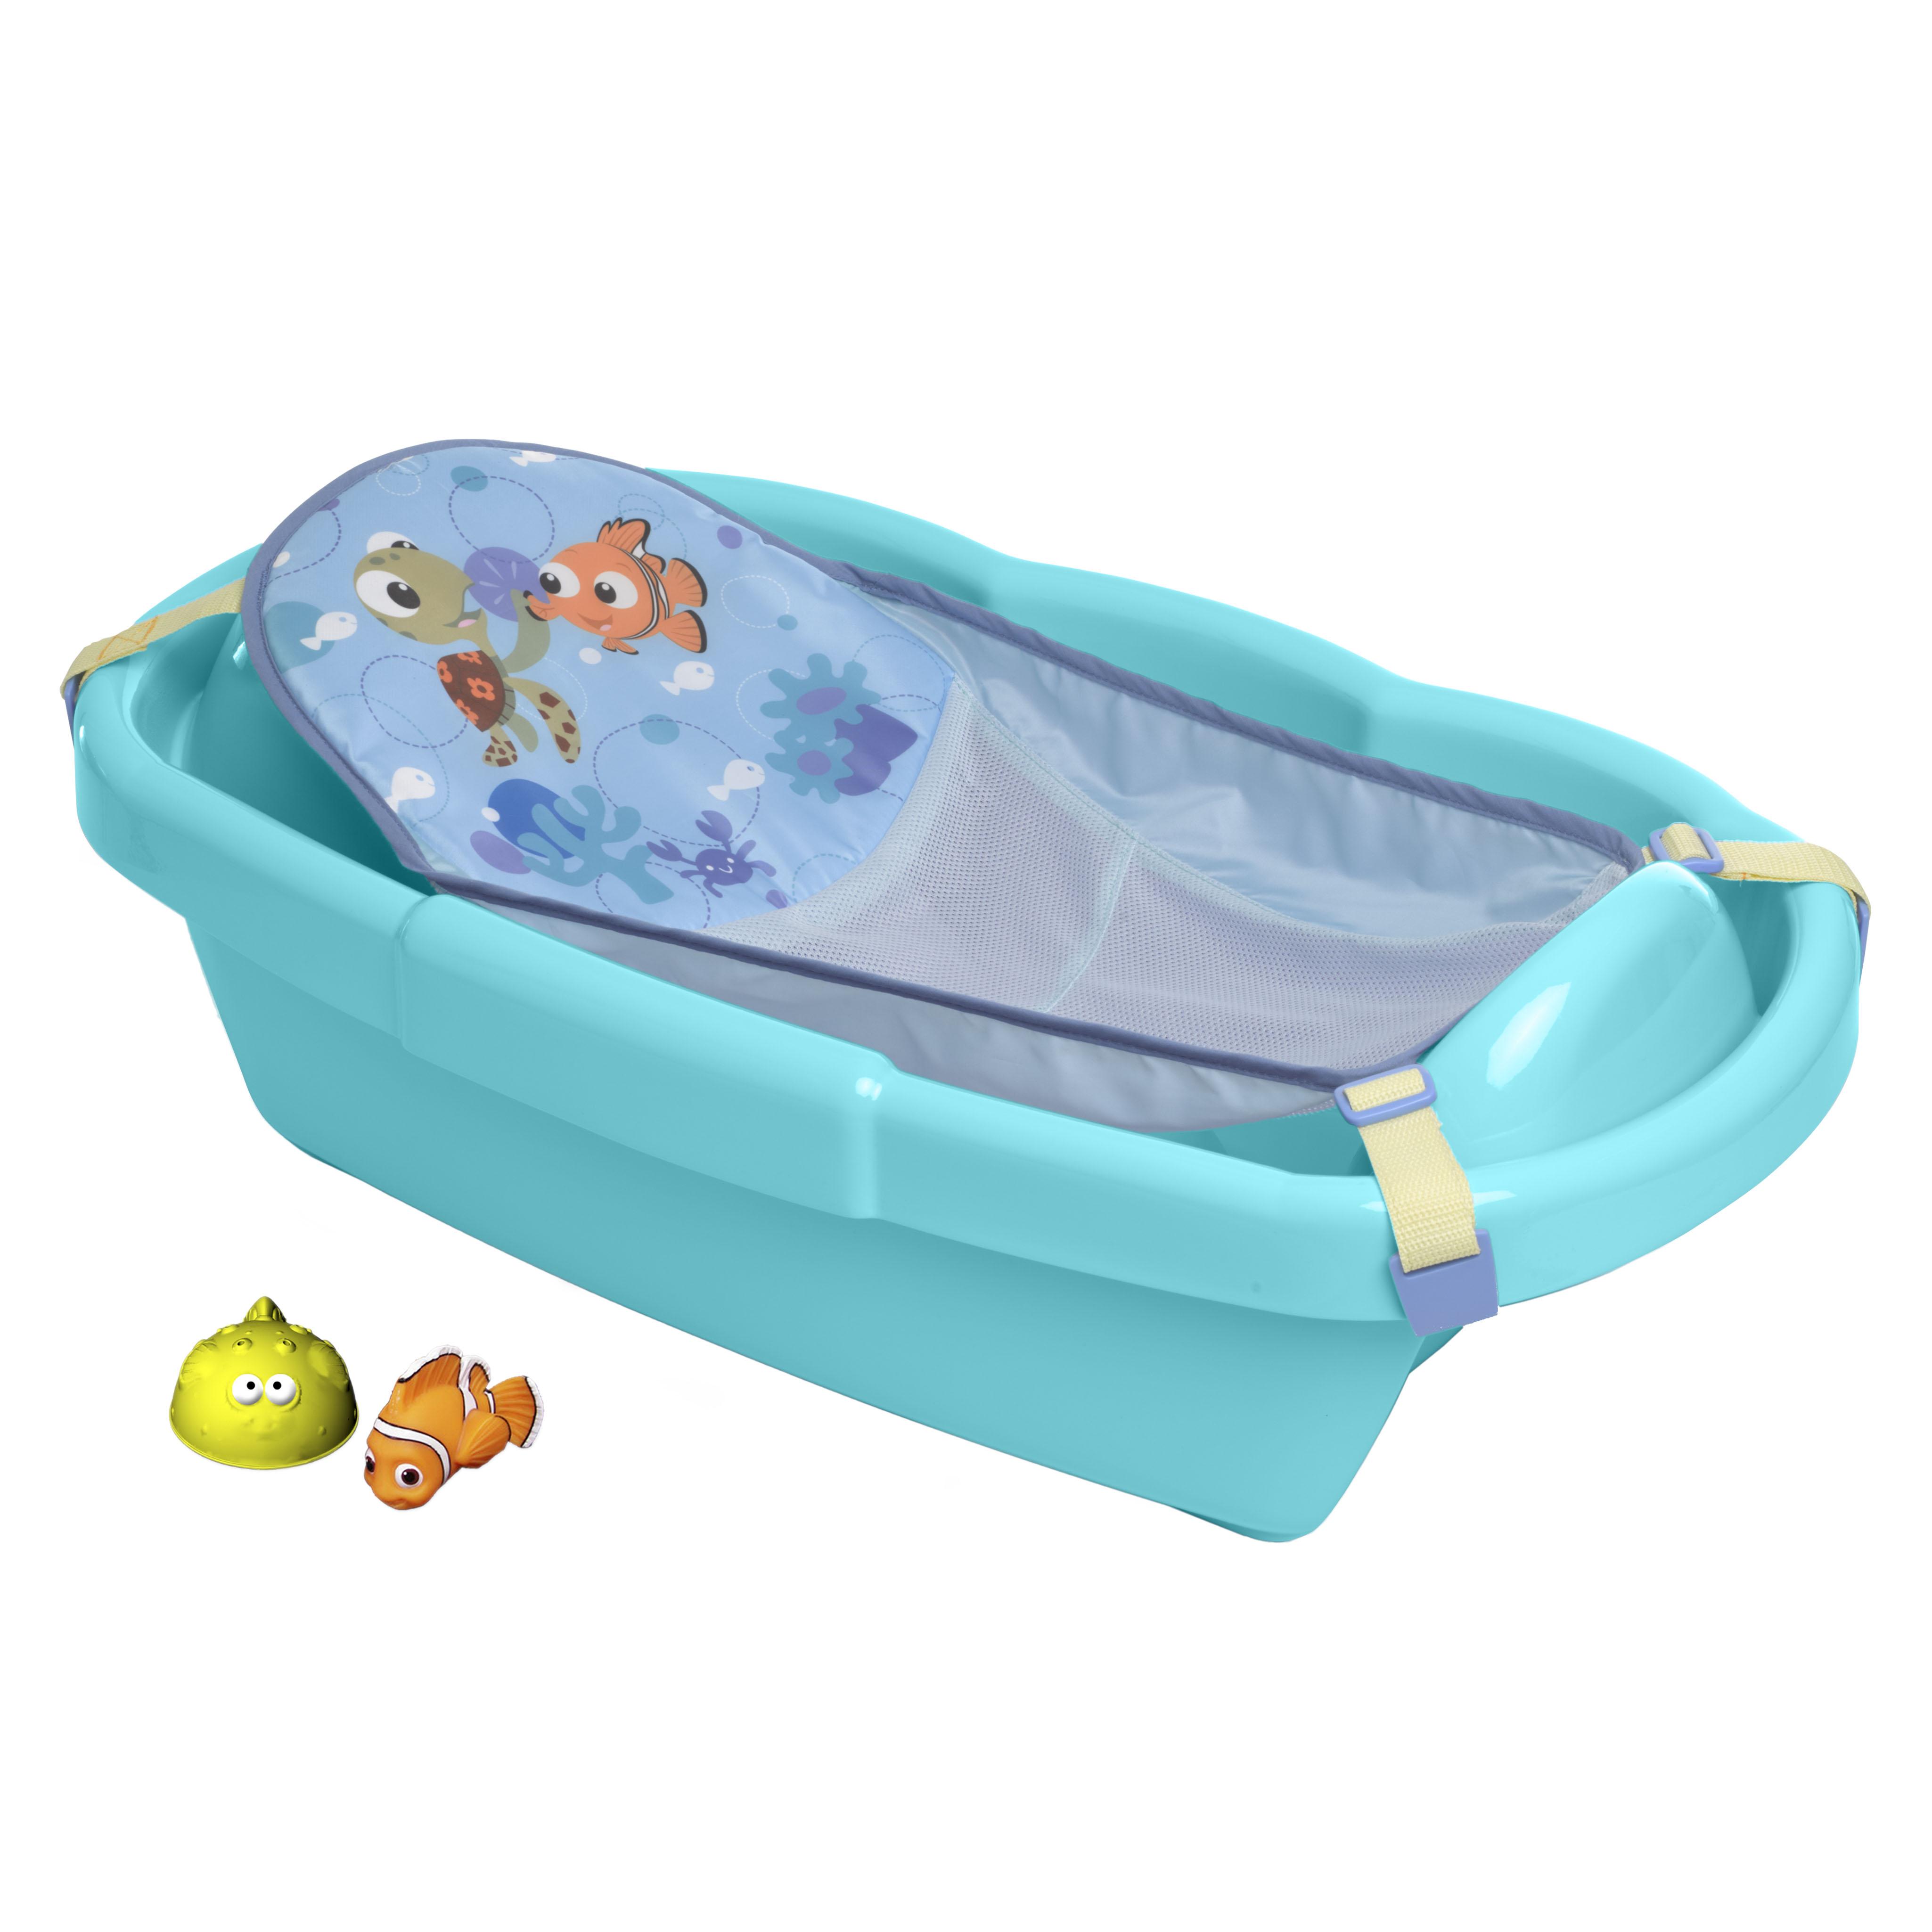 Sears Baby Bathtubs • Bathtub Ideas